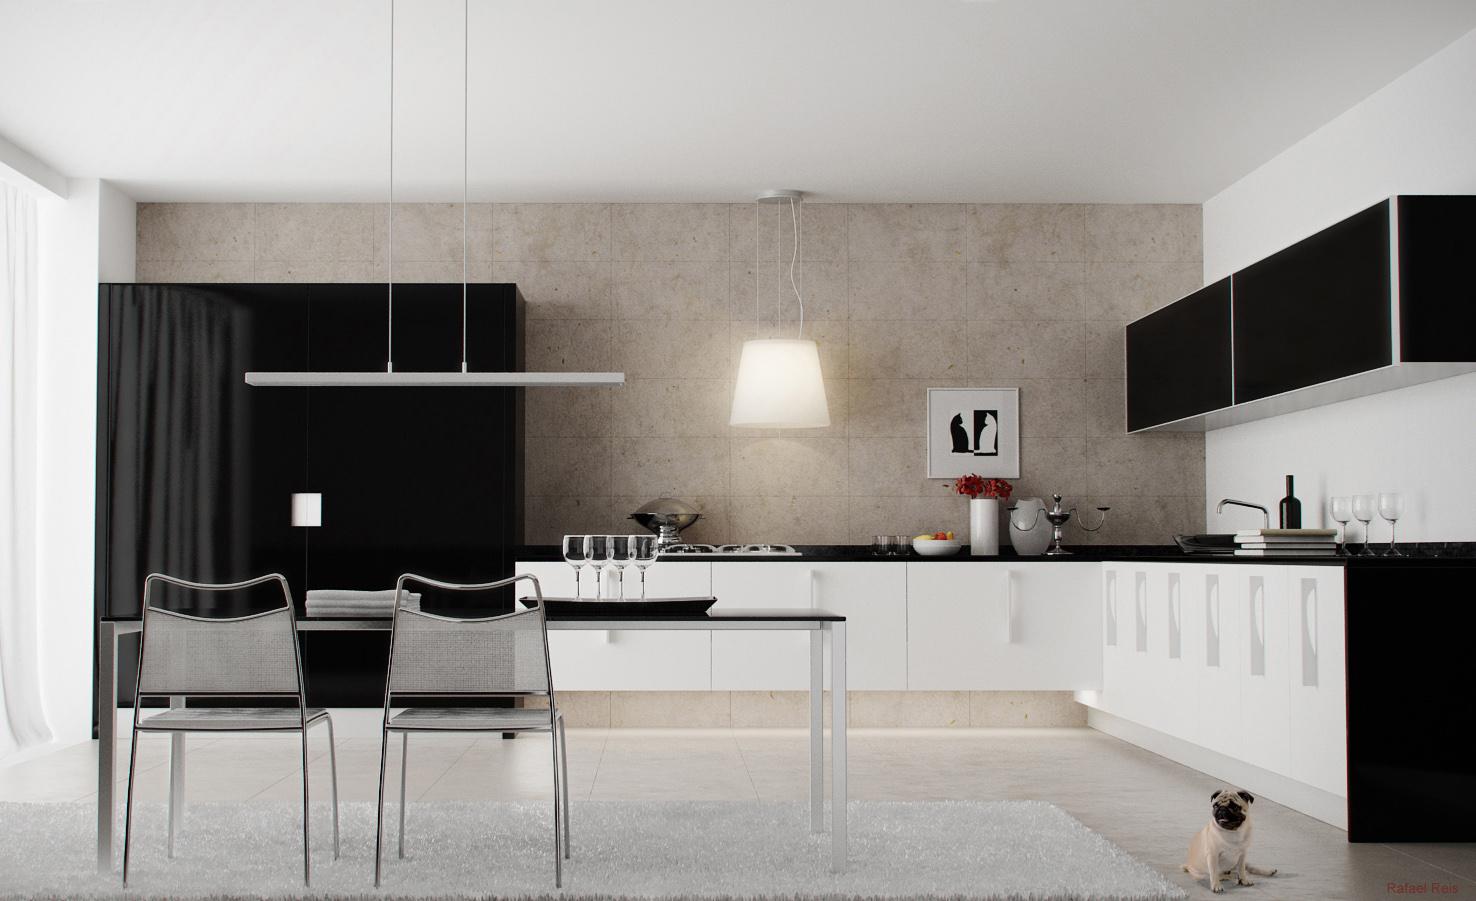 Black white kitchen diner interior design ideas - Black and white kitchen ideas ...